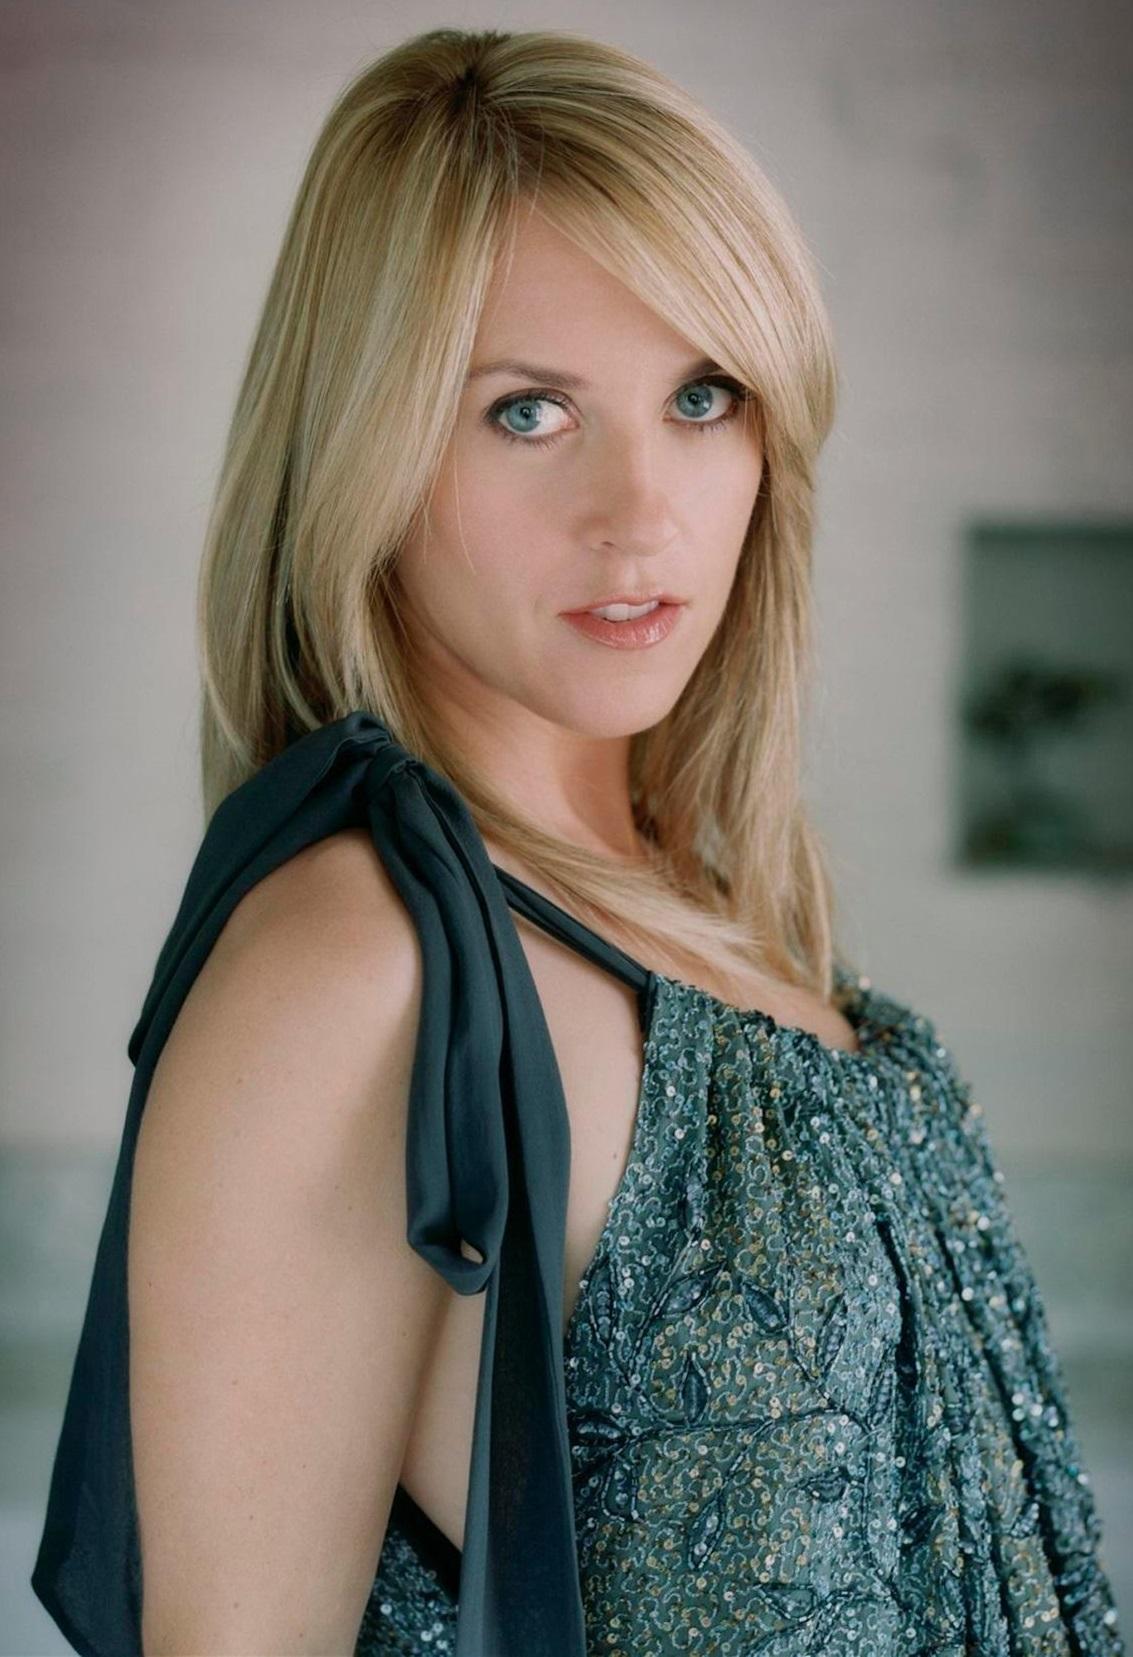 Teresa Parente nudes (51 photo), Ass, Leaked, Feet, bra 2006